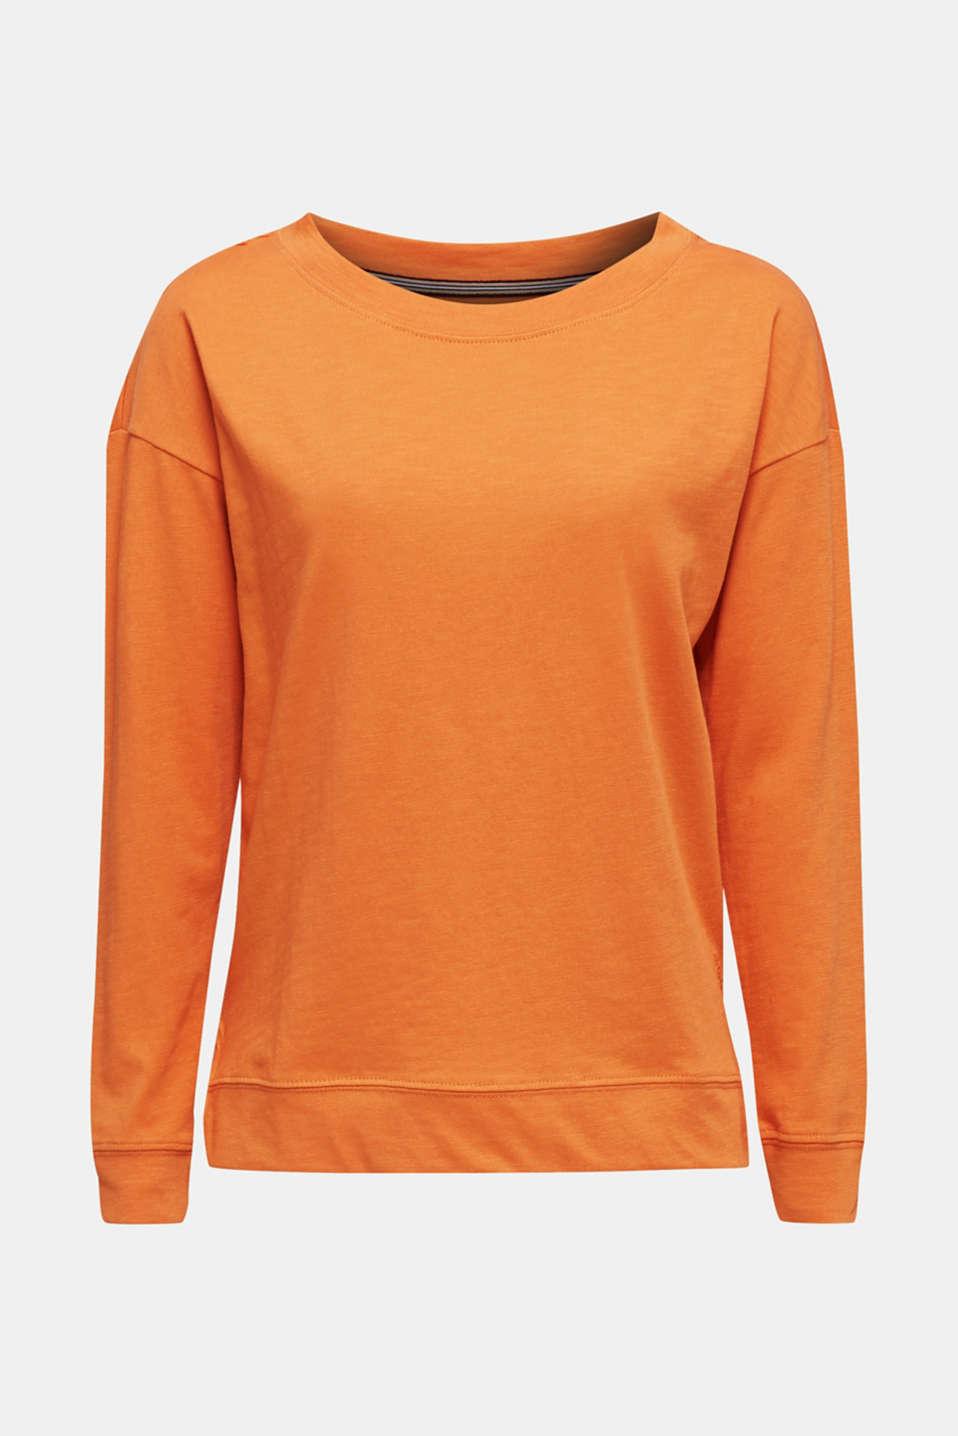 Slub sweatshirt made of 100% organic cotton, RUST ORANGE, detail image number 6